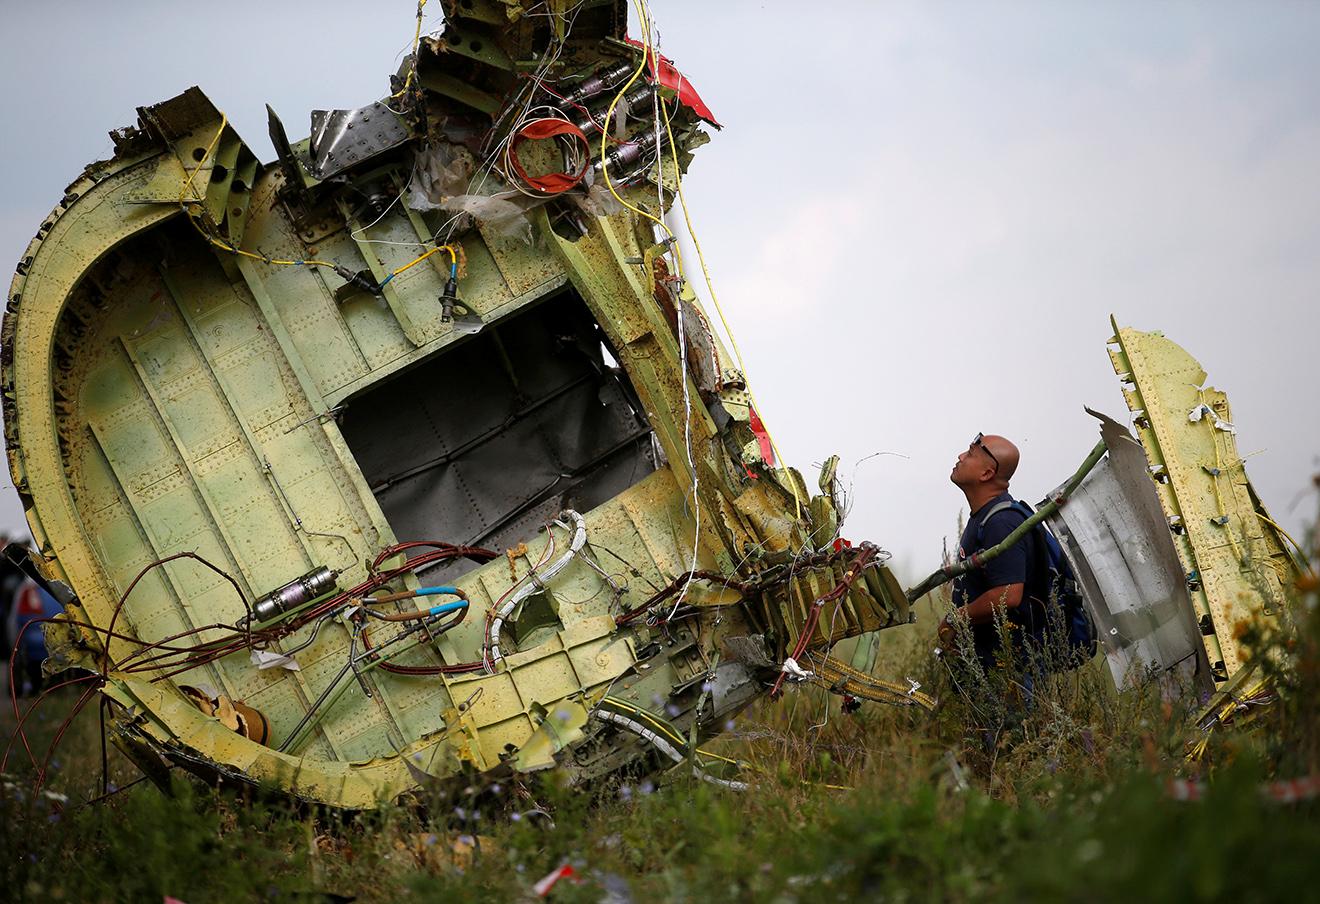 Малазийский эксперт по авиакатастрофам на месте крушения рейса МН17 «Малазийских авиалиний». Фото: Максим Змеев / Reuters